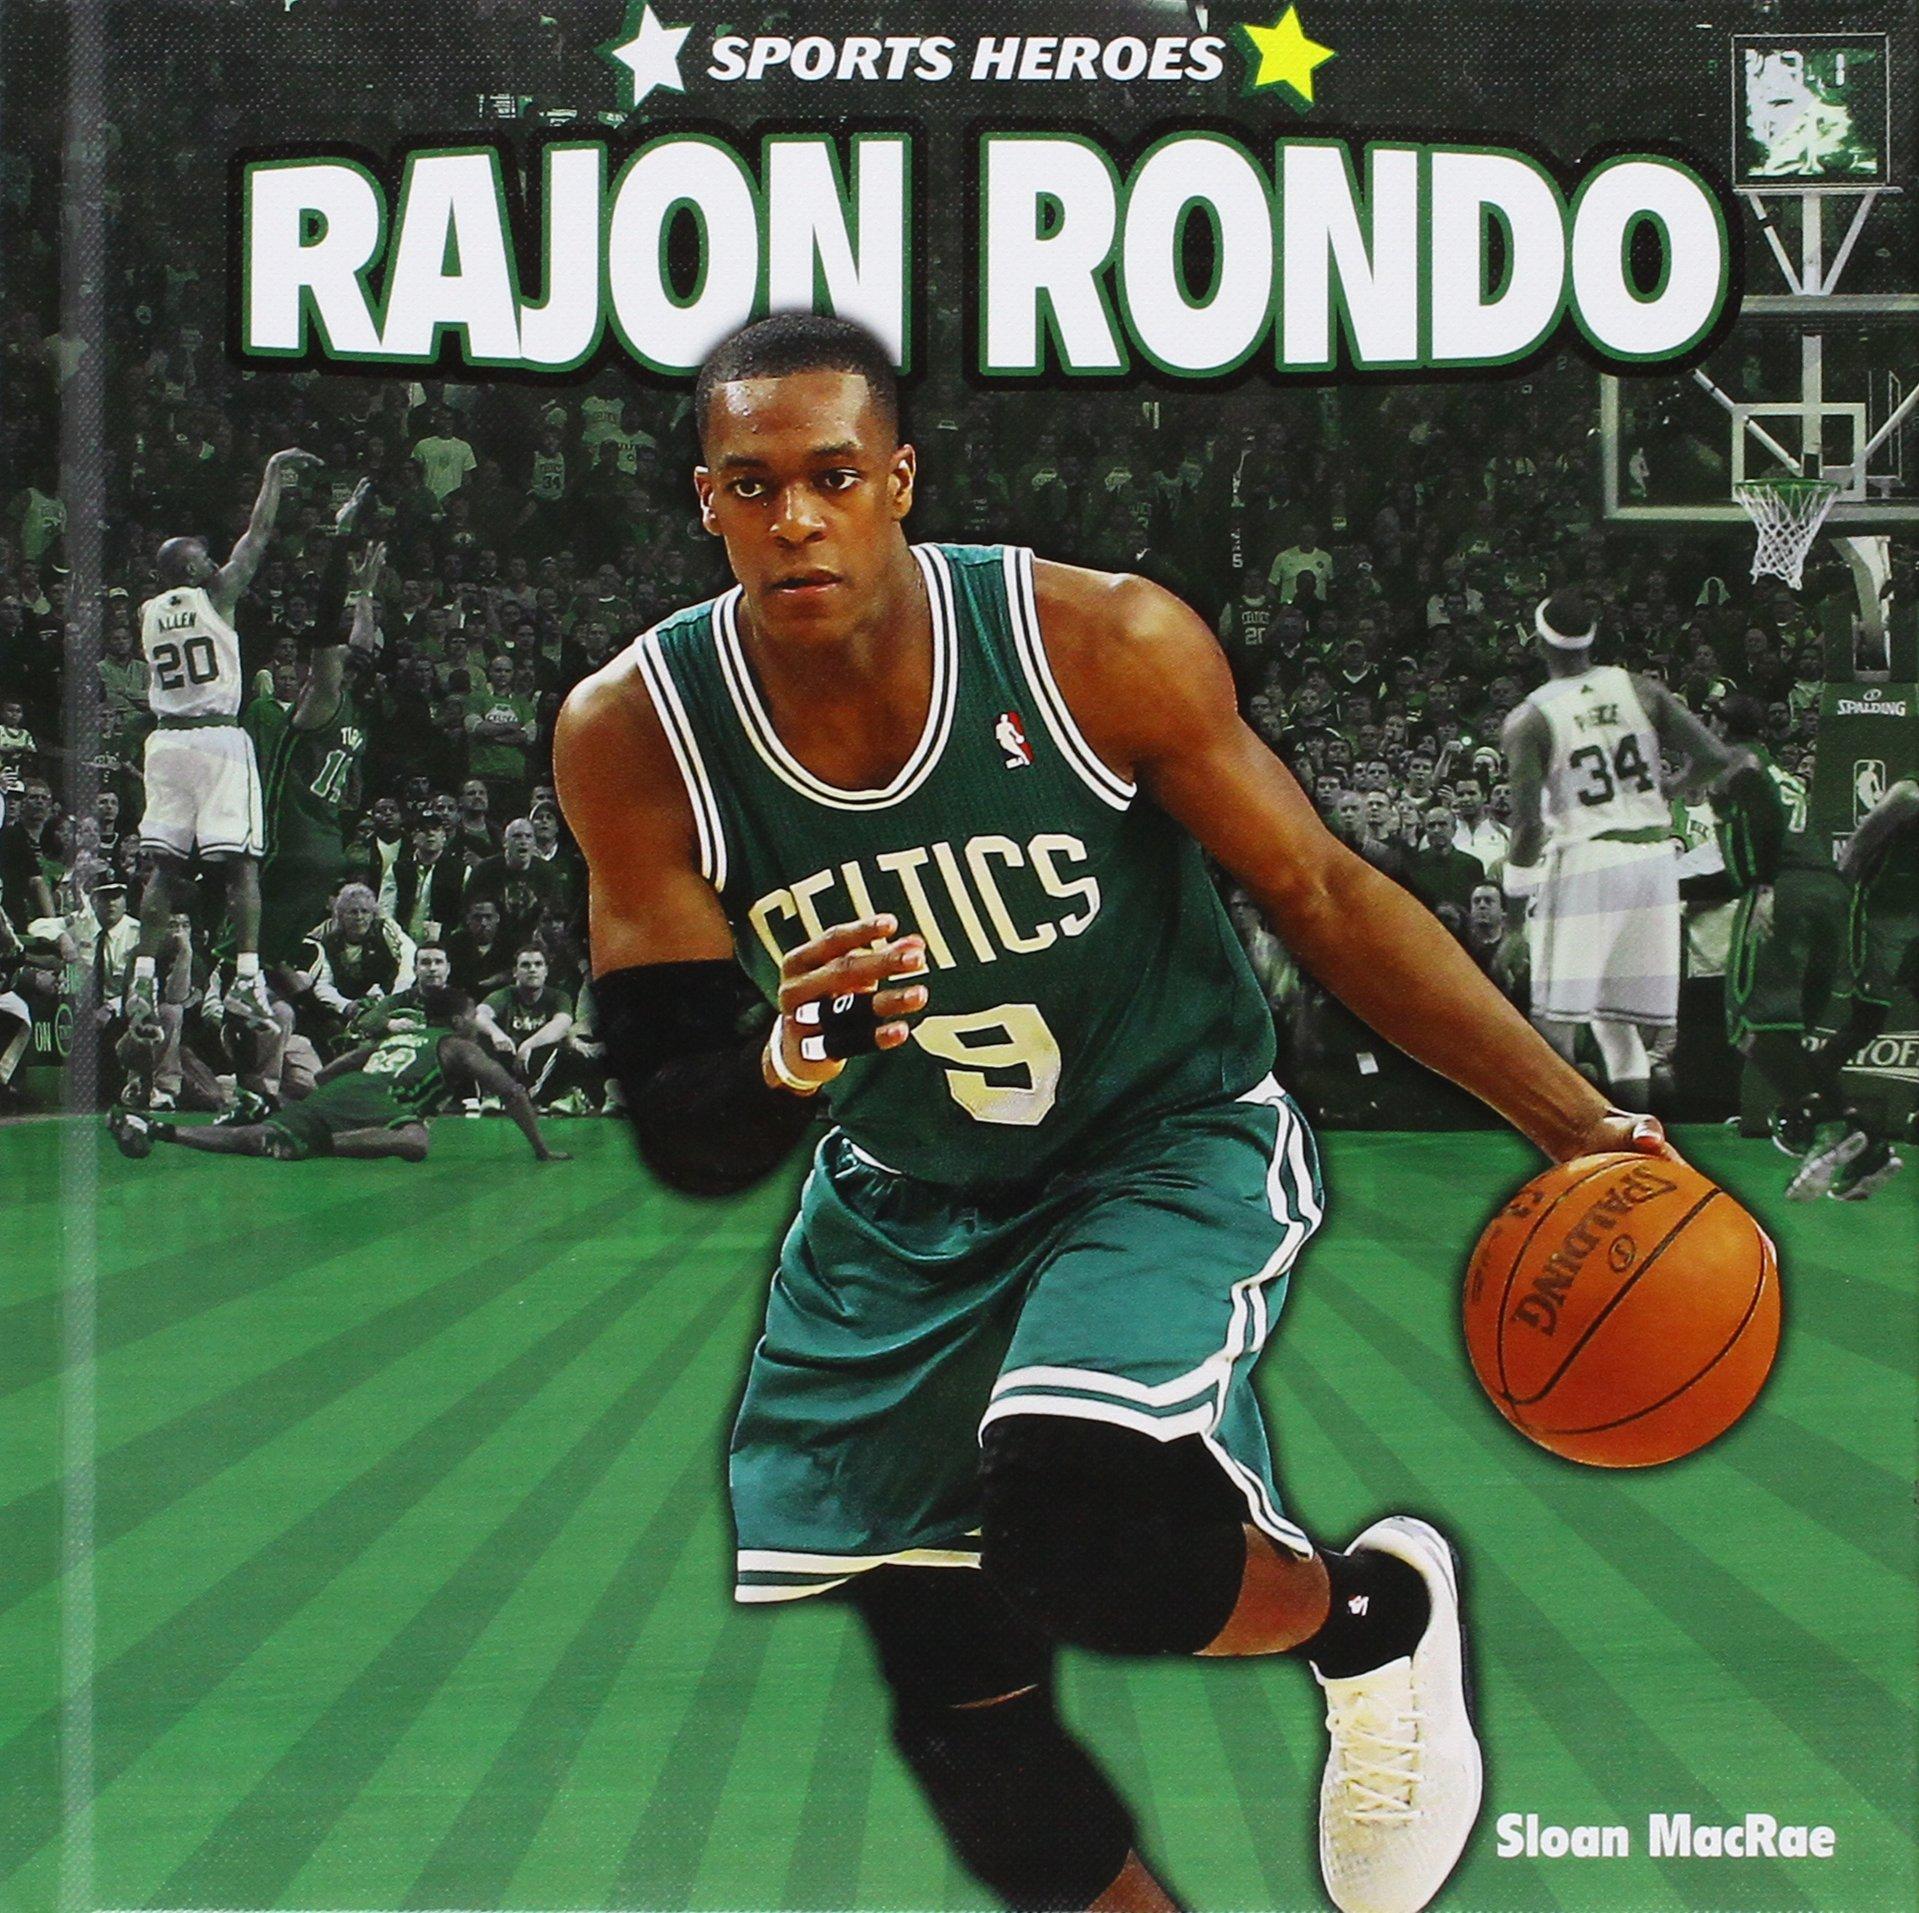 Rajon Rondo (Sports Heroes)